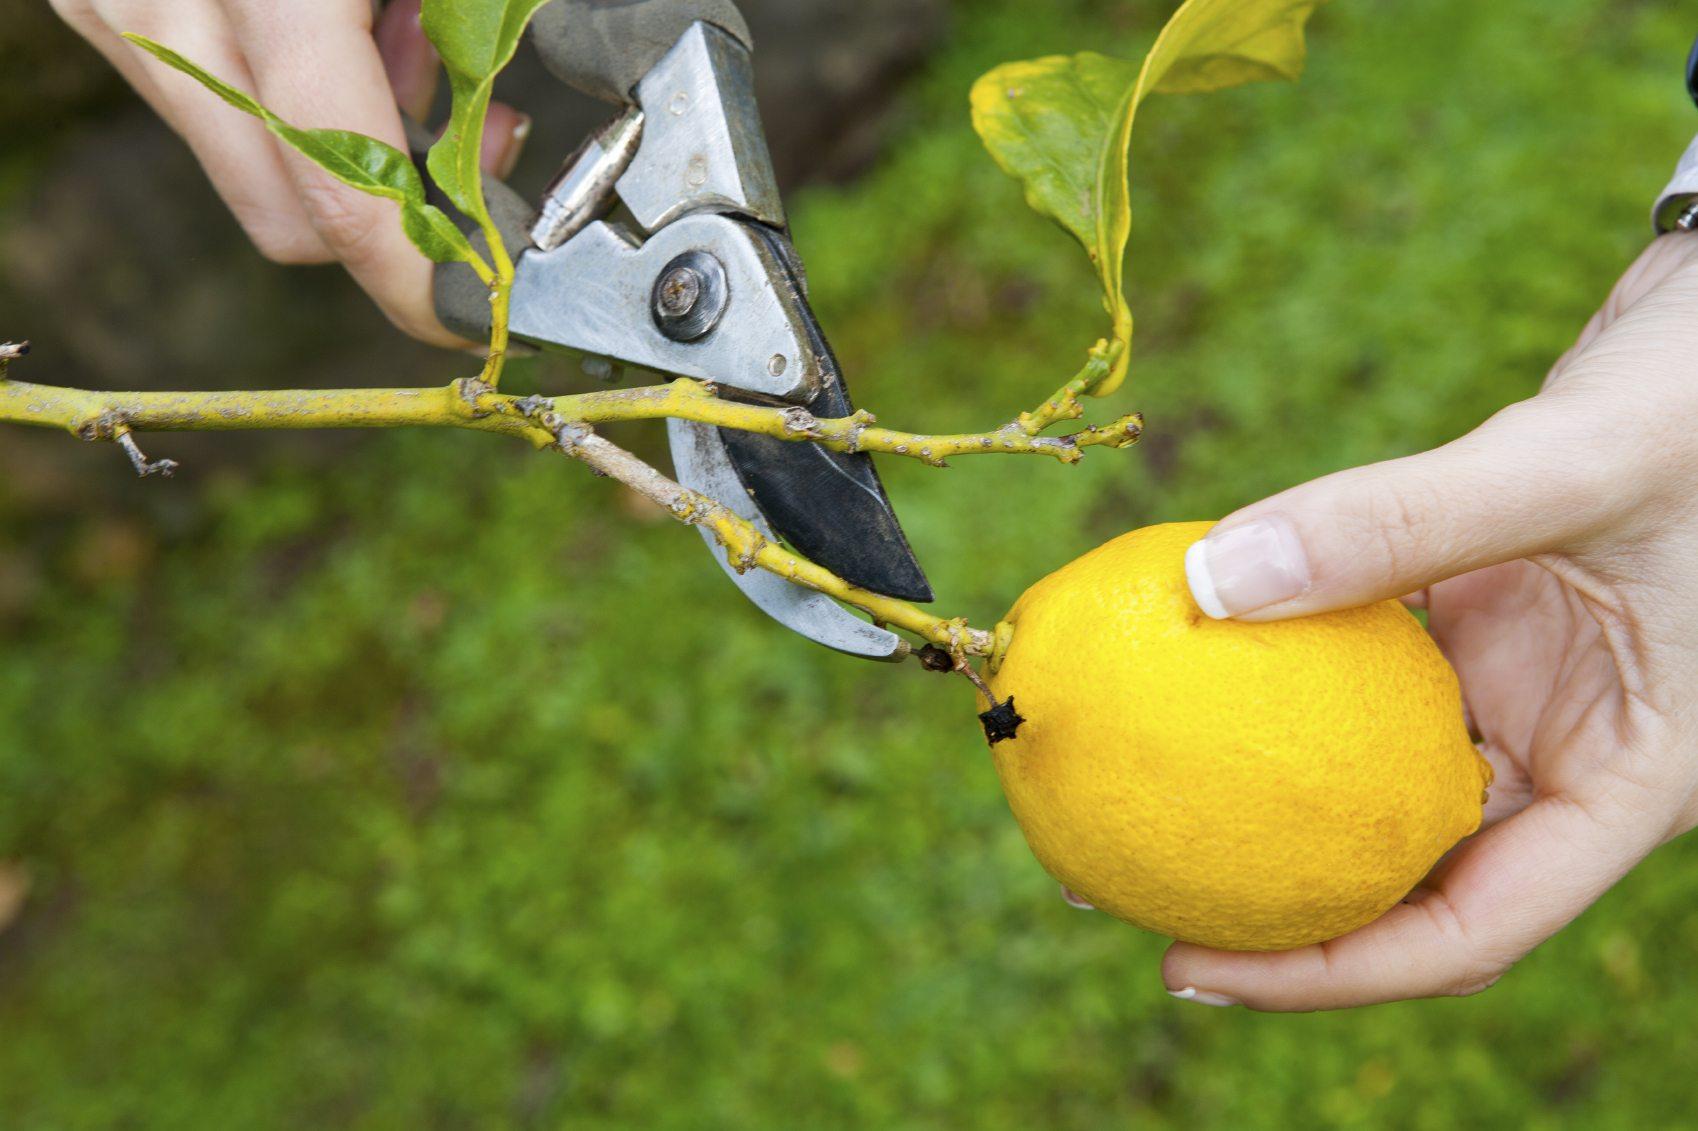 Pruning the Lemon tree